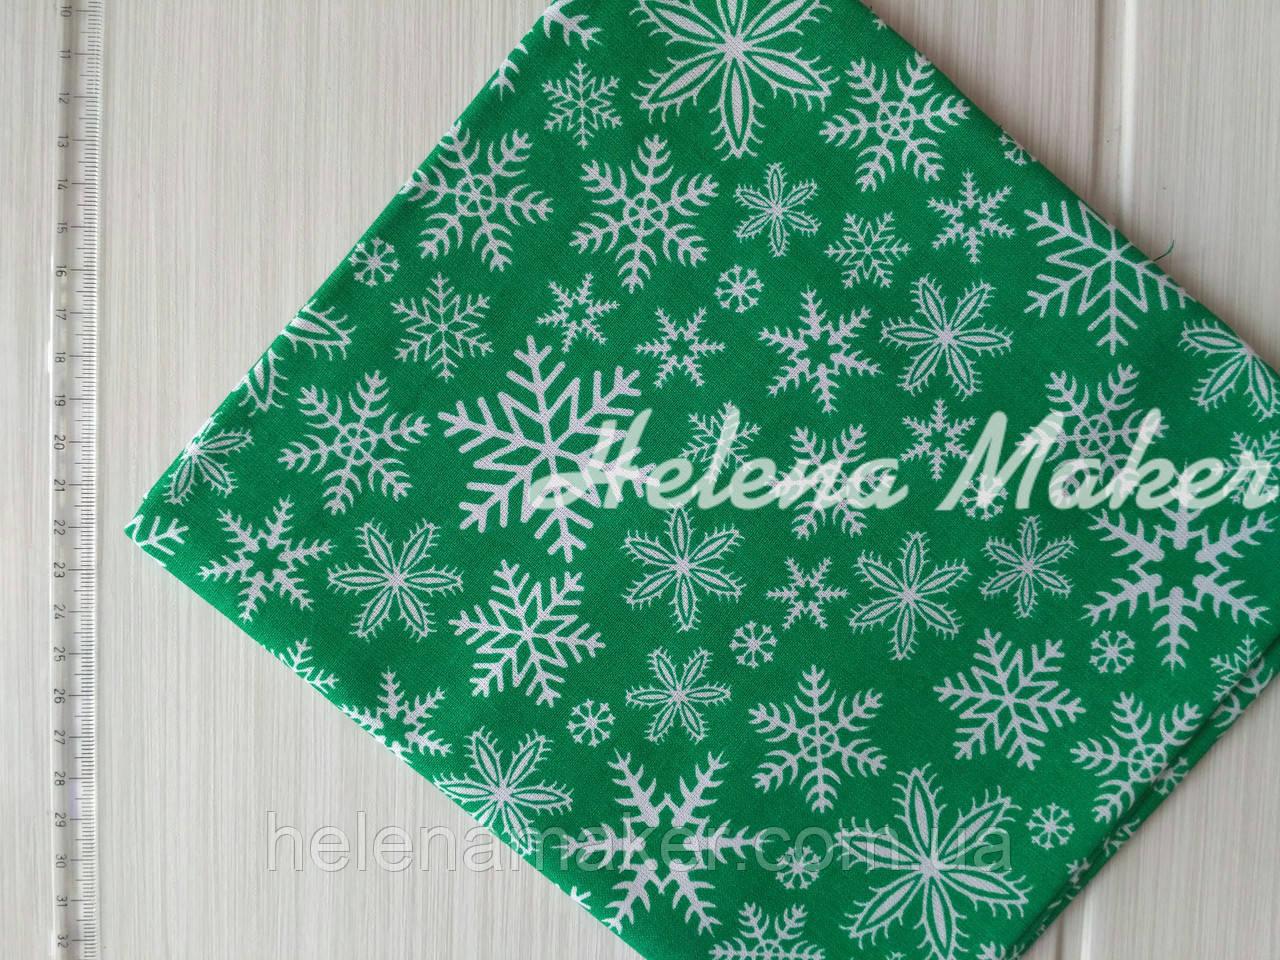 Отрез новогодней ткани Снежинки на зеленом фоне 50*50 см